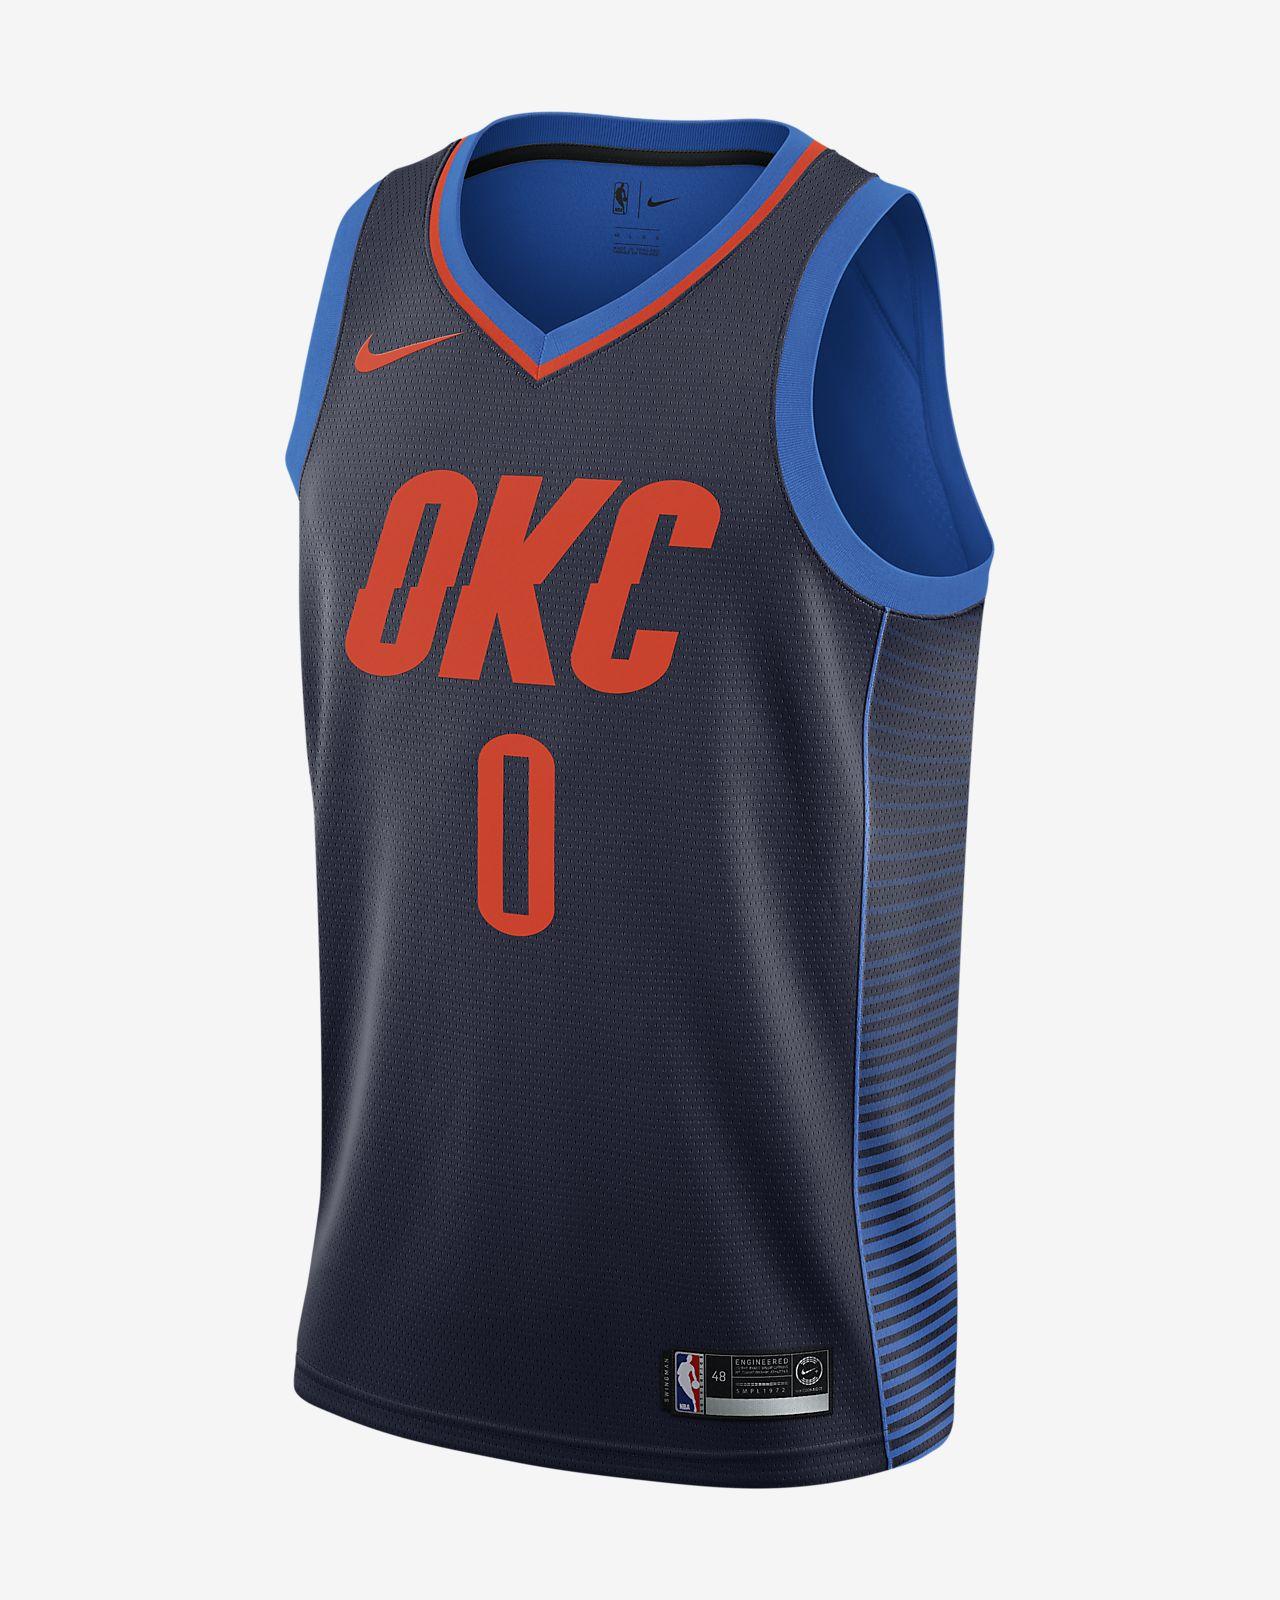 俄克拉荷马城雷霆队 (Russell Westbrook) Statement Edition Swingman Nike NBA Connected Jersey 男子球衣